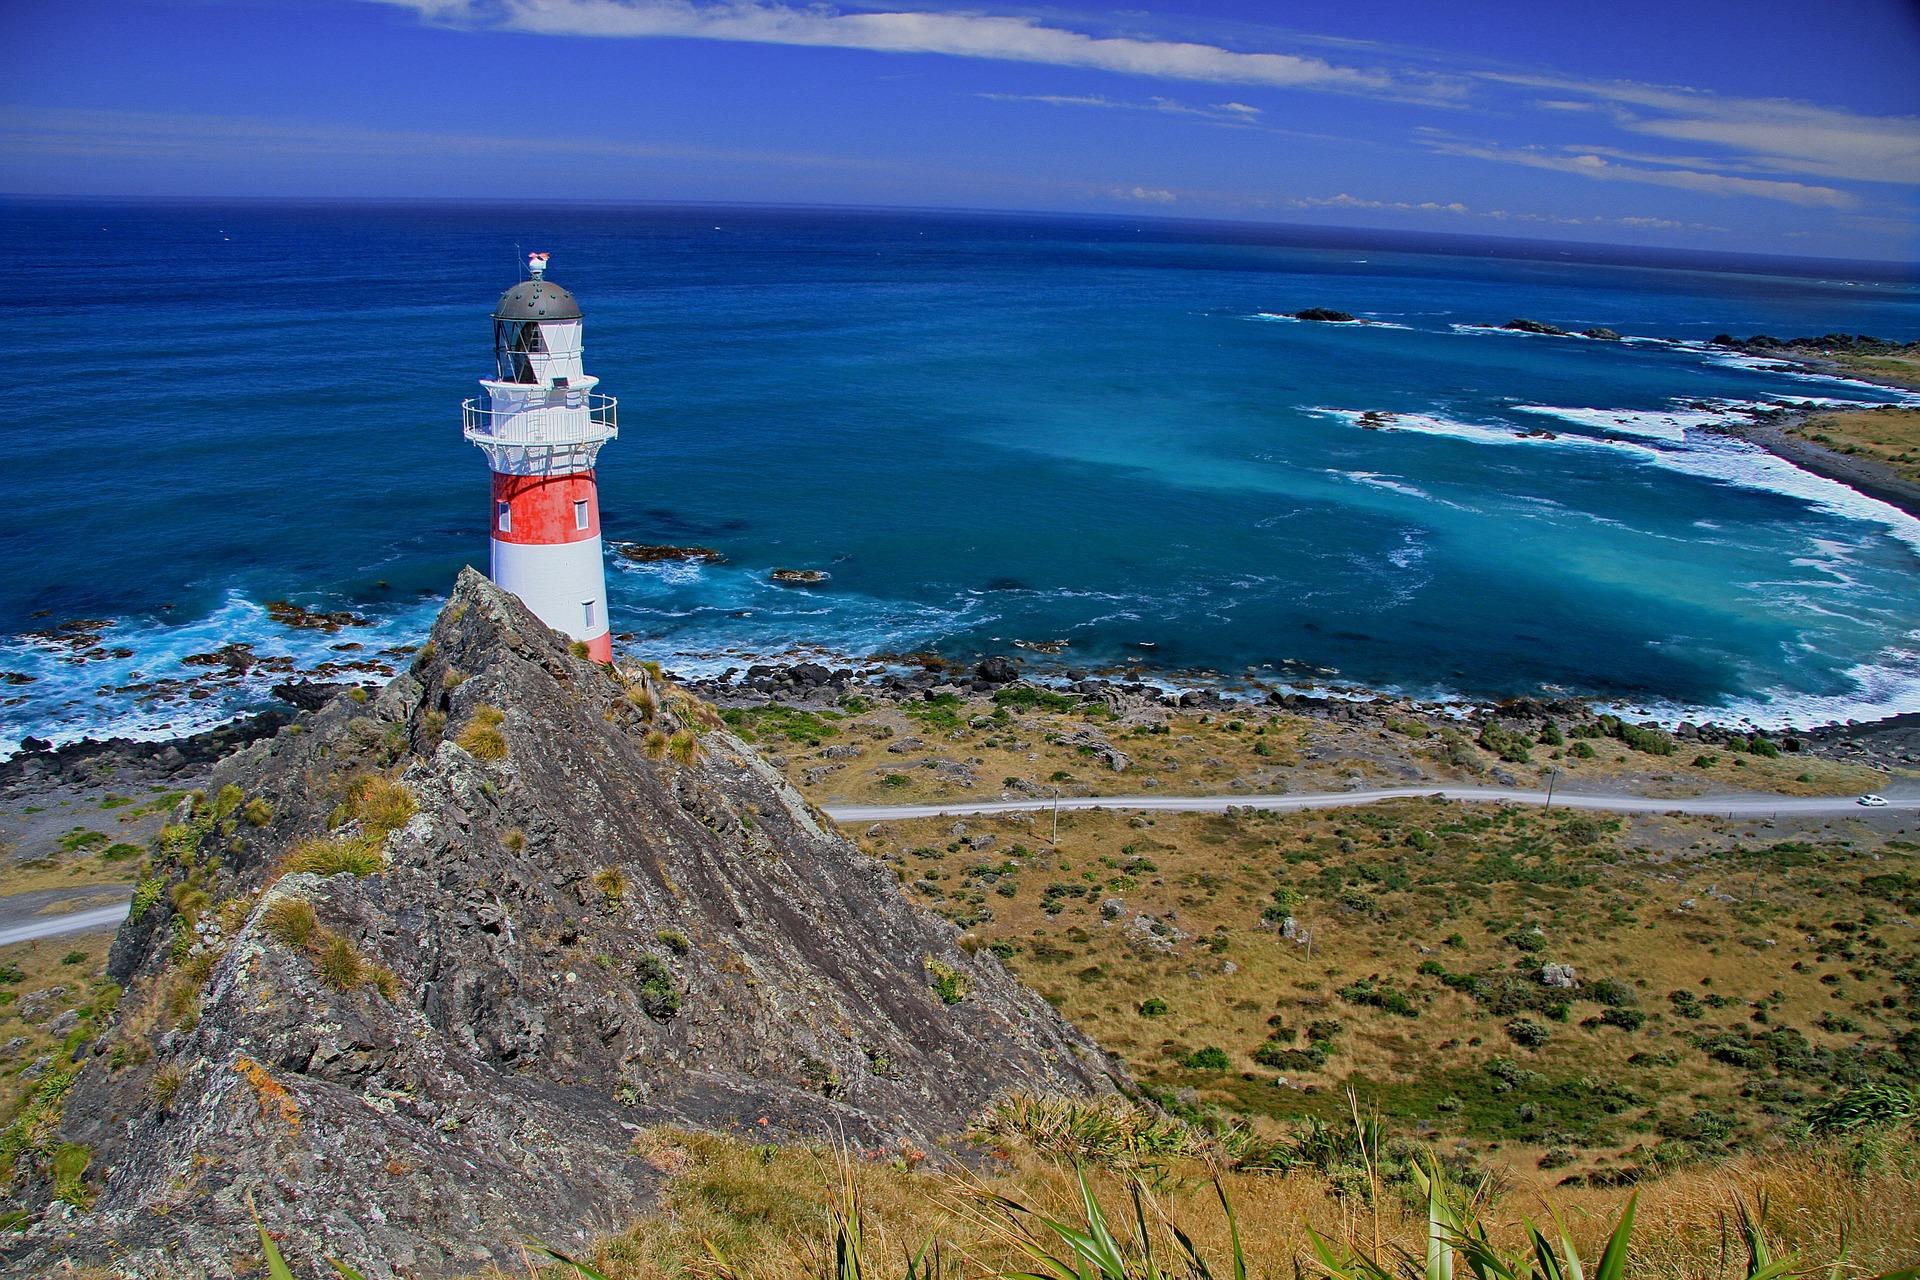 lighthouse-93489_1920.jpg